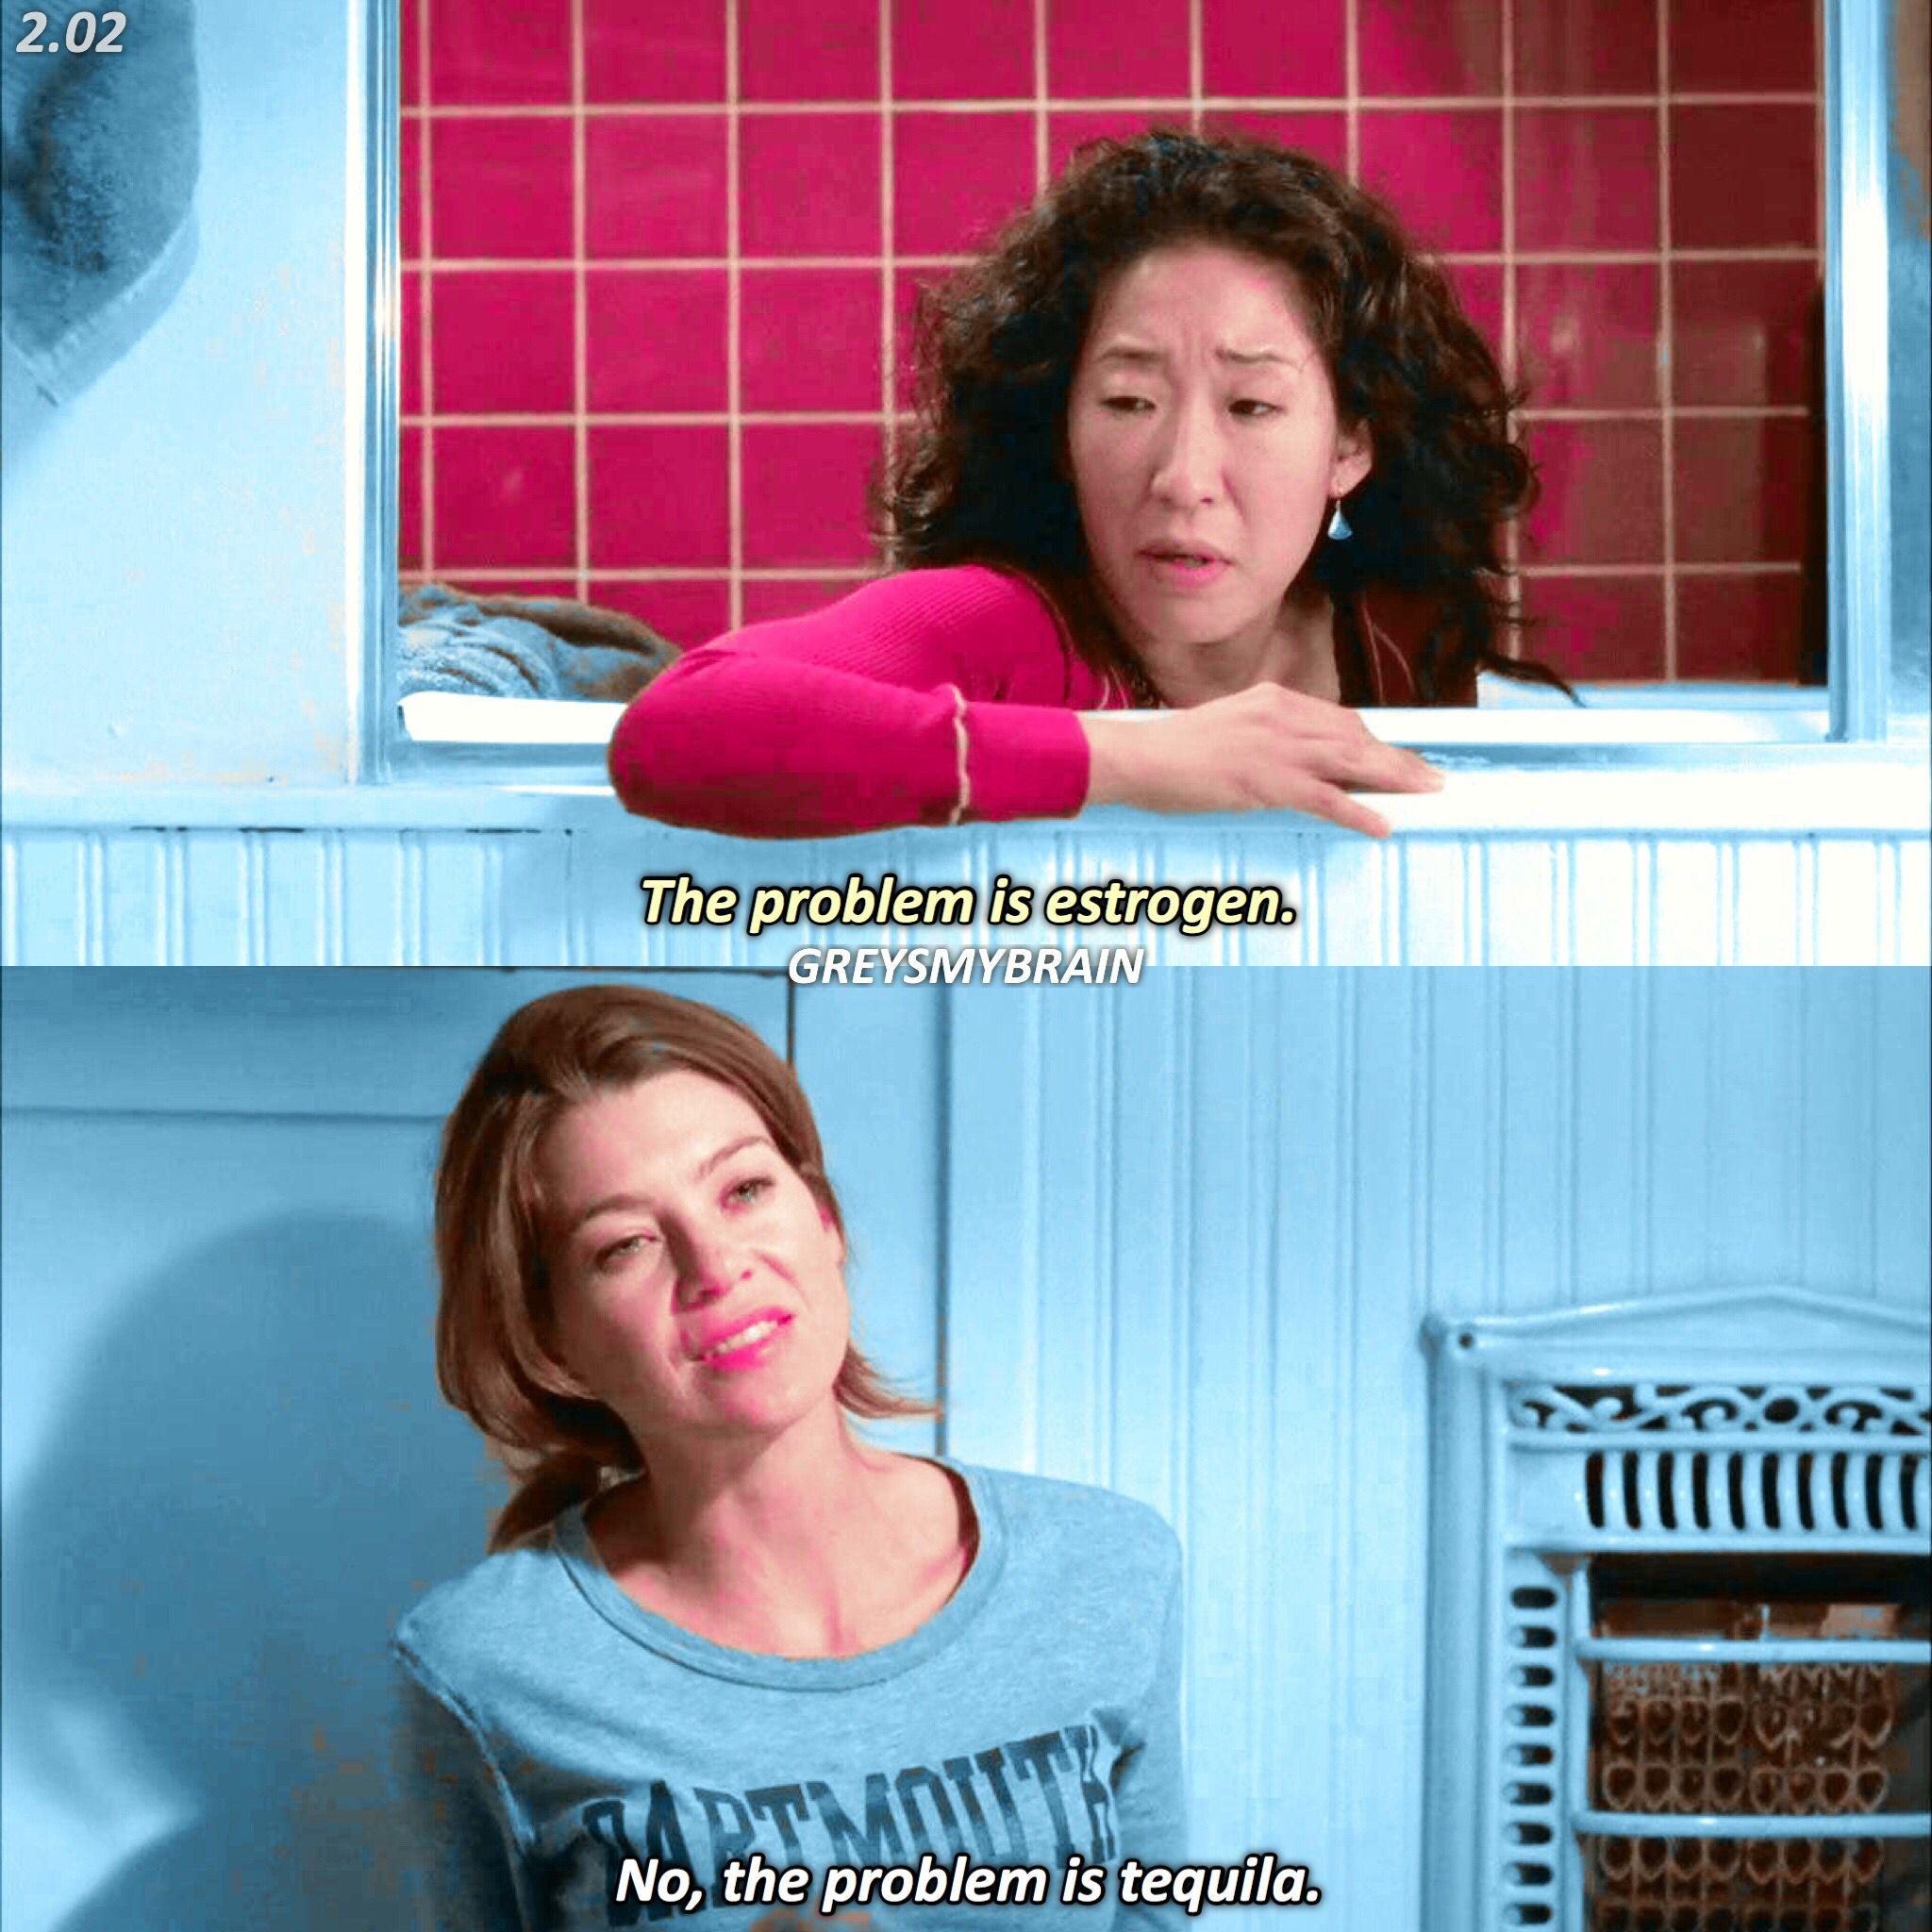 2 02 Iconic Grey Anatomy Quotes Greys Anatomy Memes Greys Anatomy Funny